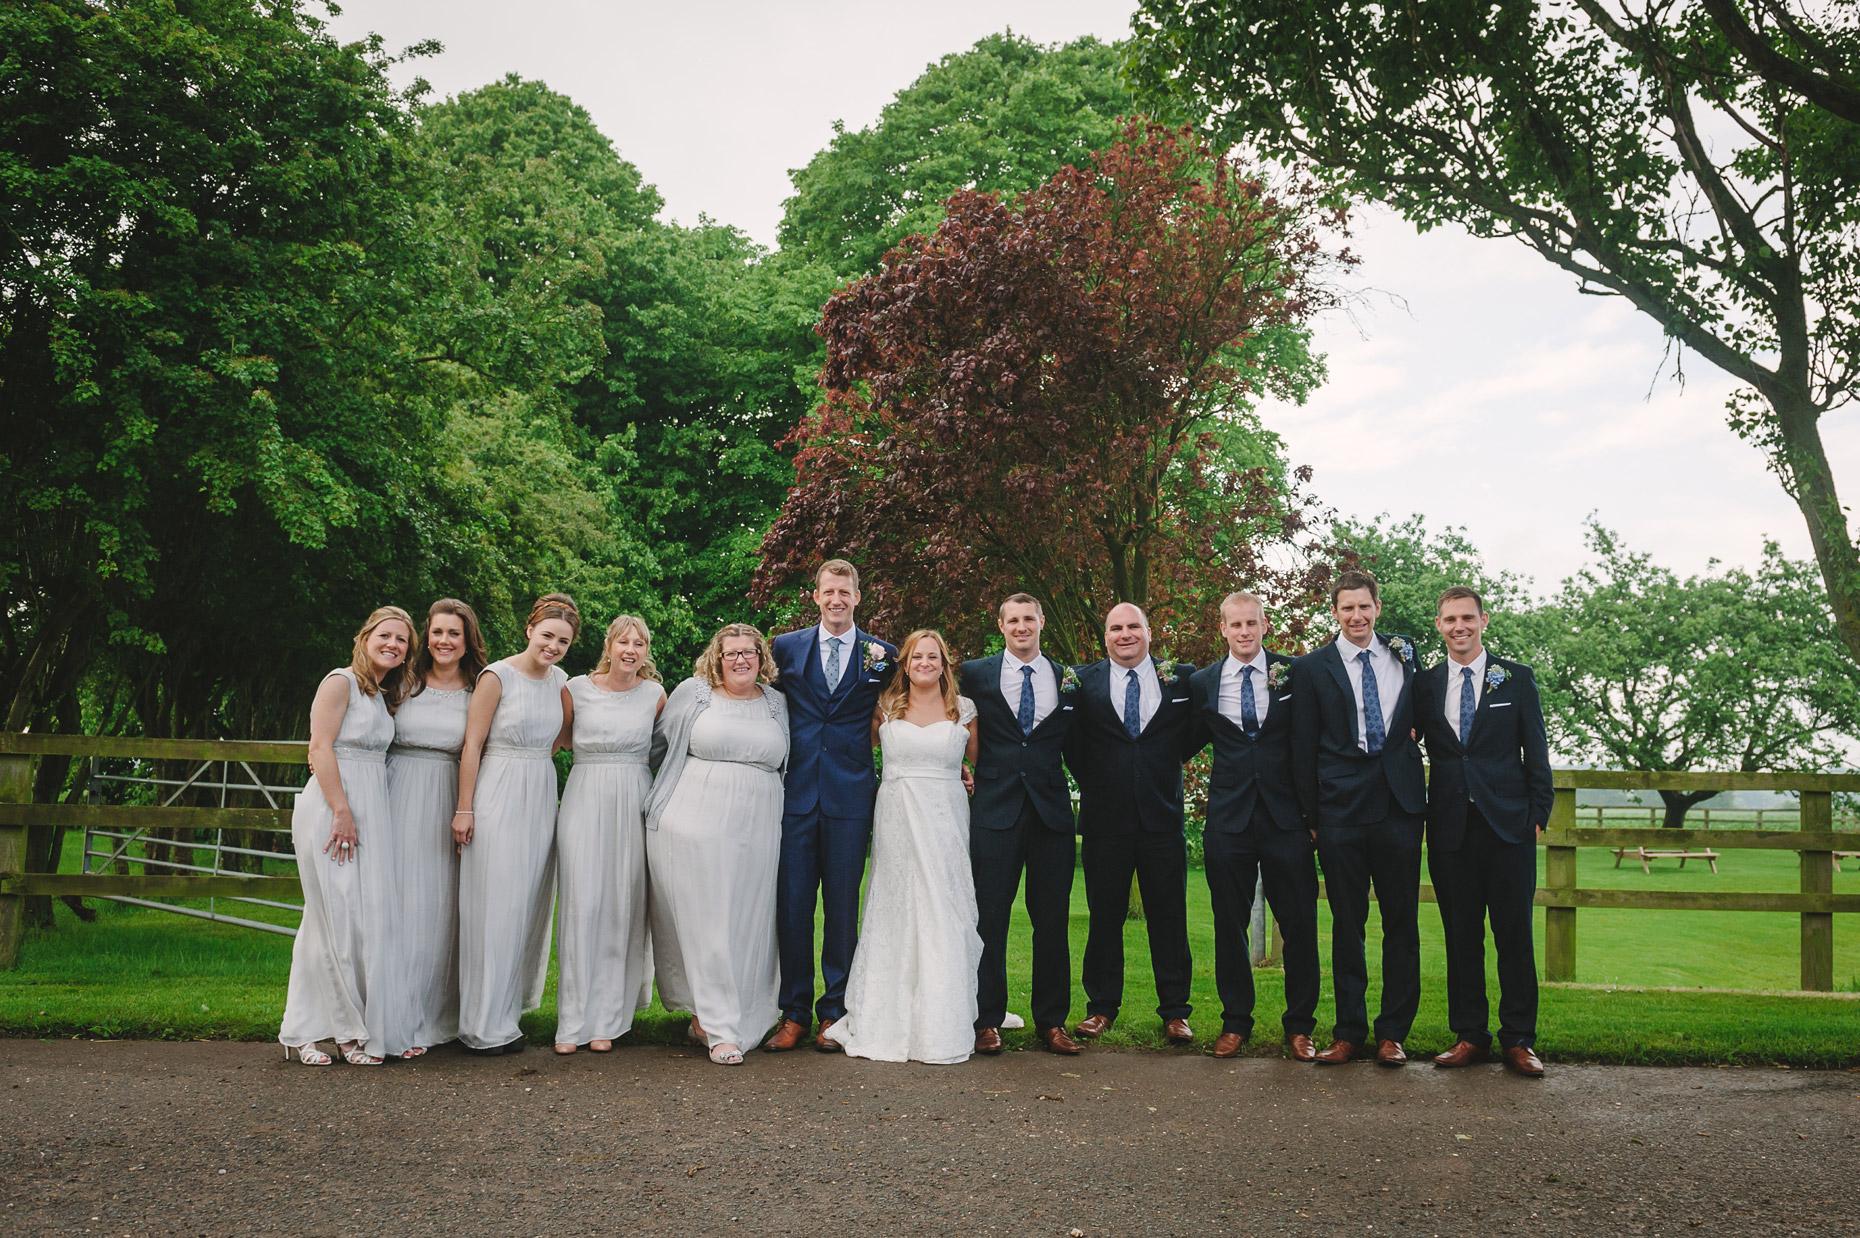 barmbyfield_barn_wedding_photos185.jpg